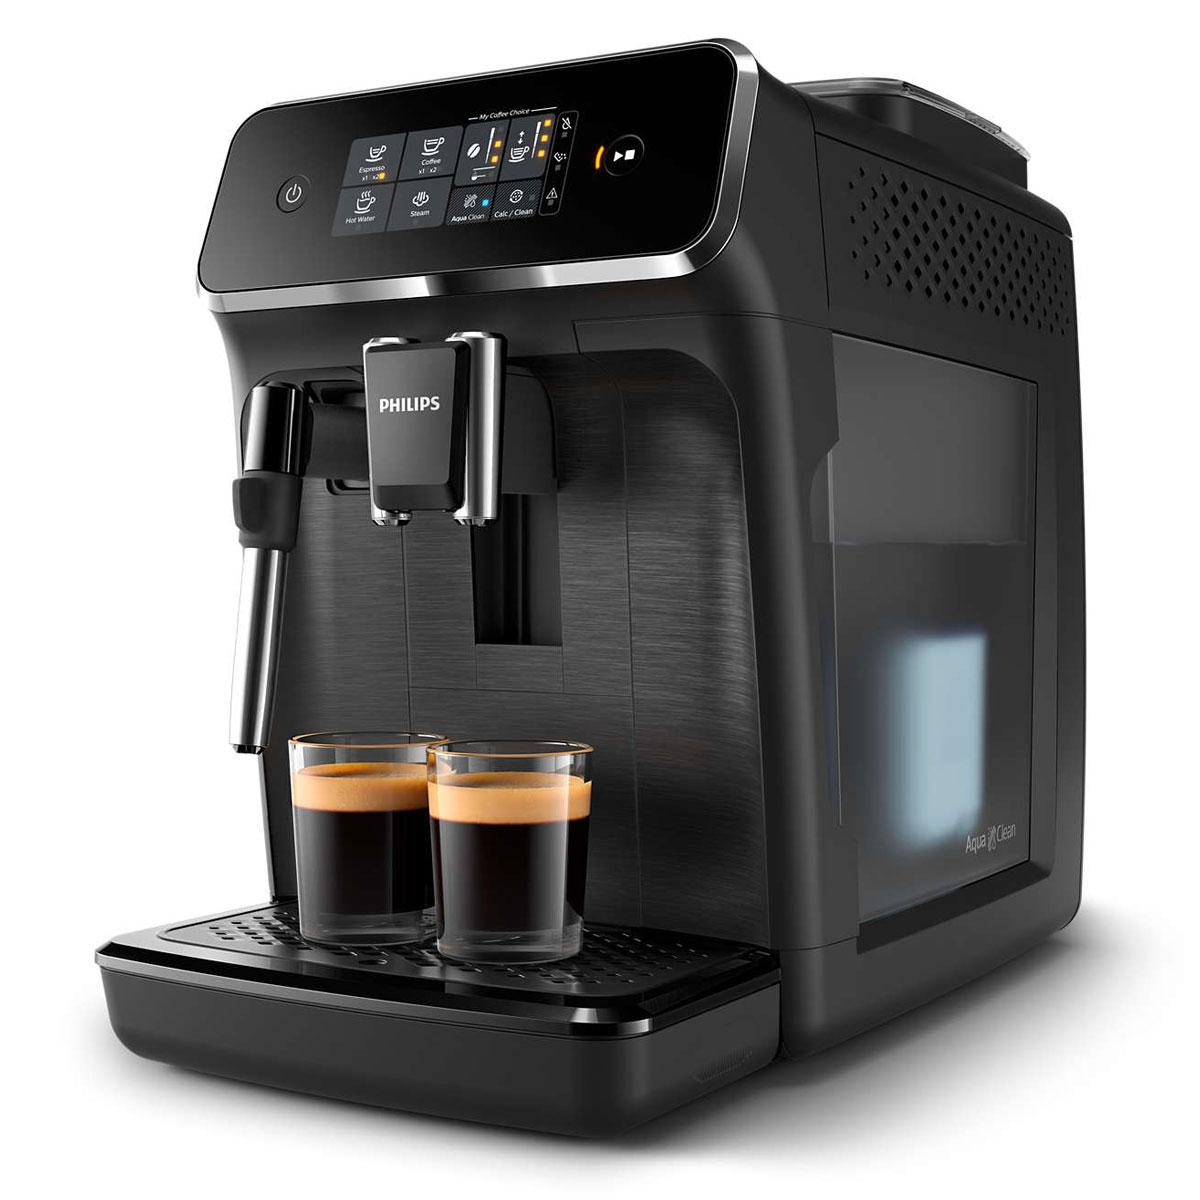 Philips / Saeco Series 2200 Classic Milk Frother Super Automatic Espresso Machine - EP2220/14